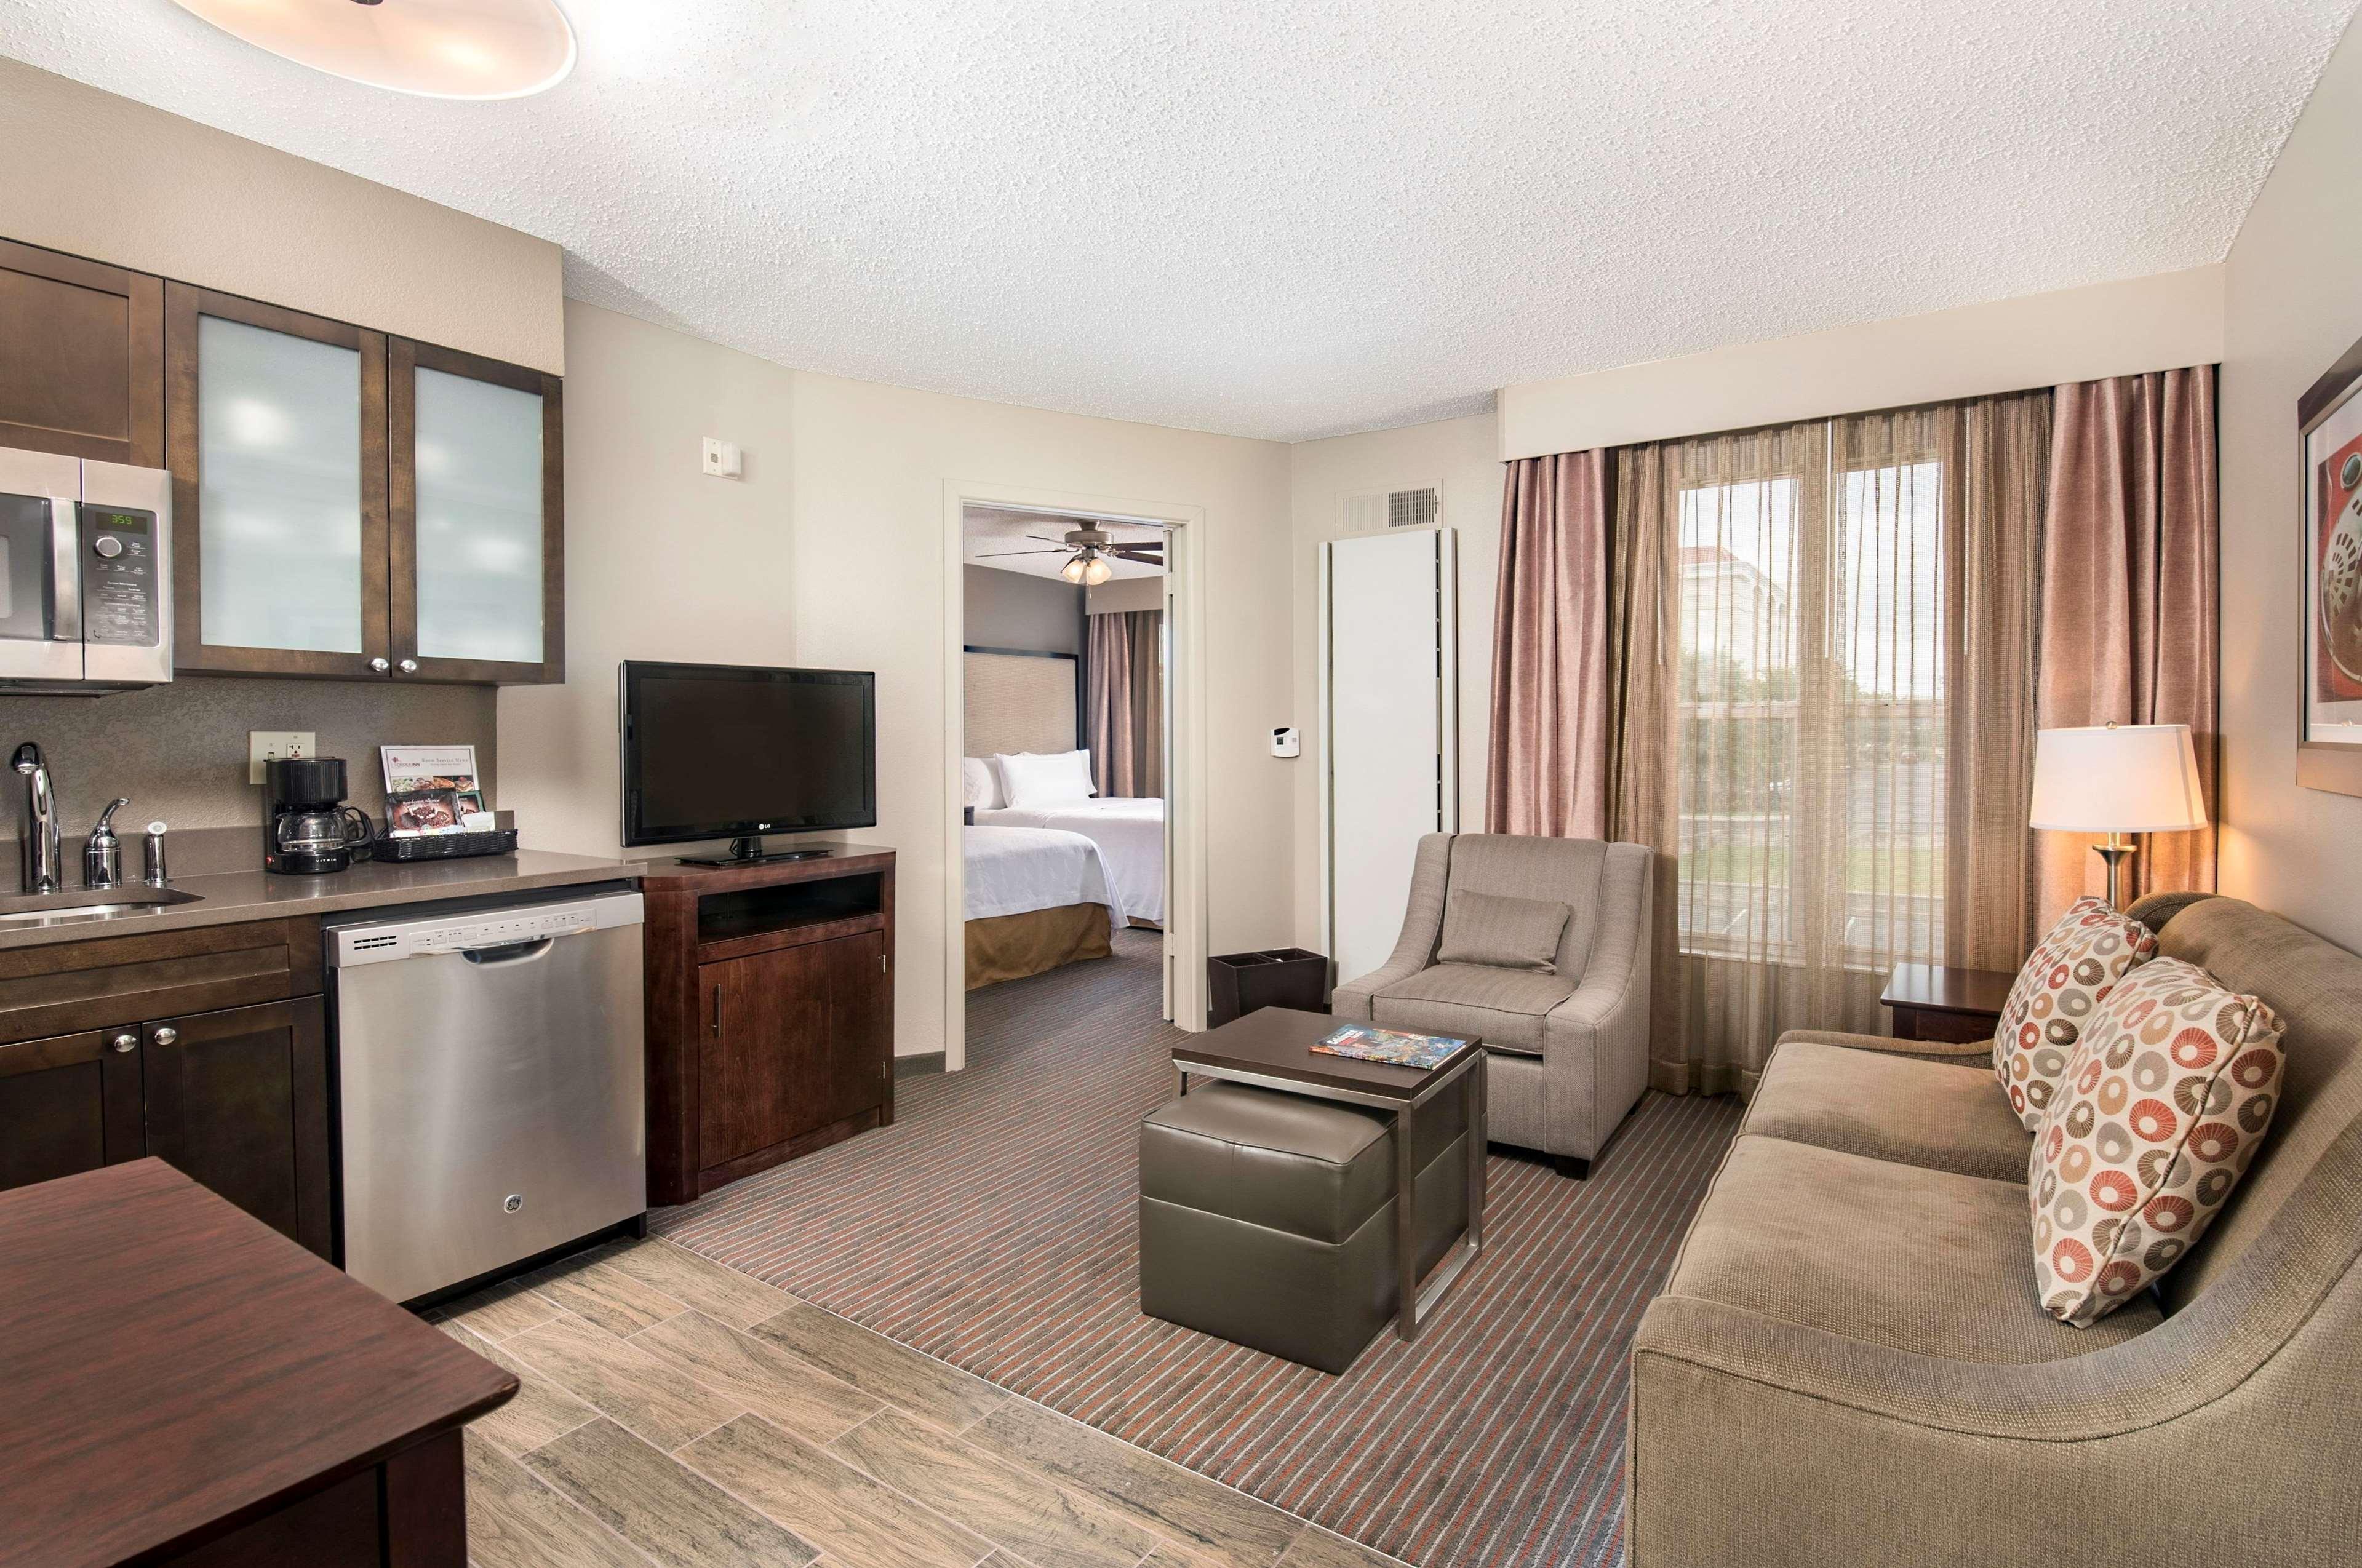 Homewood Suites by Hilton Austin-South/Airport image 11